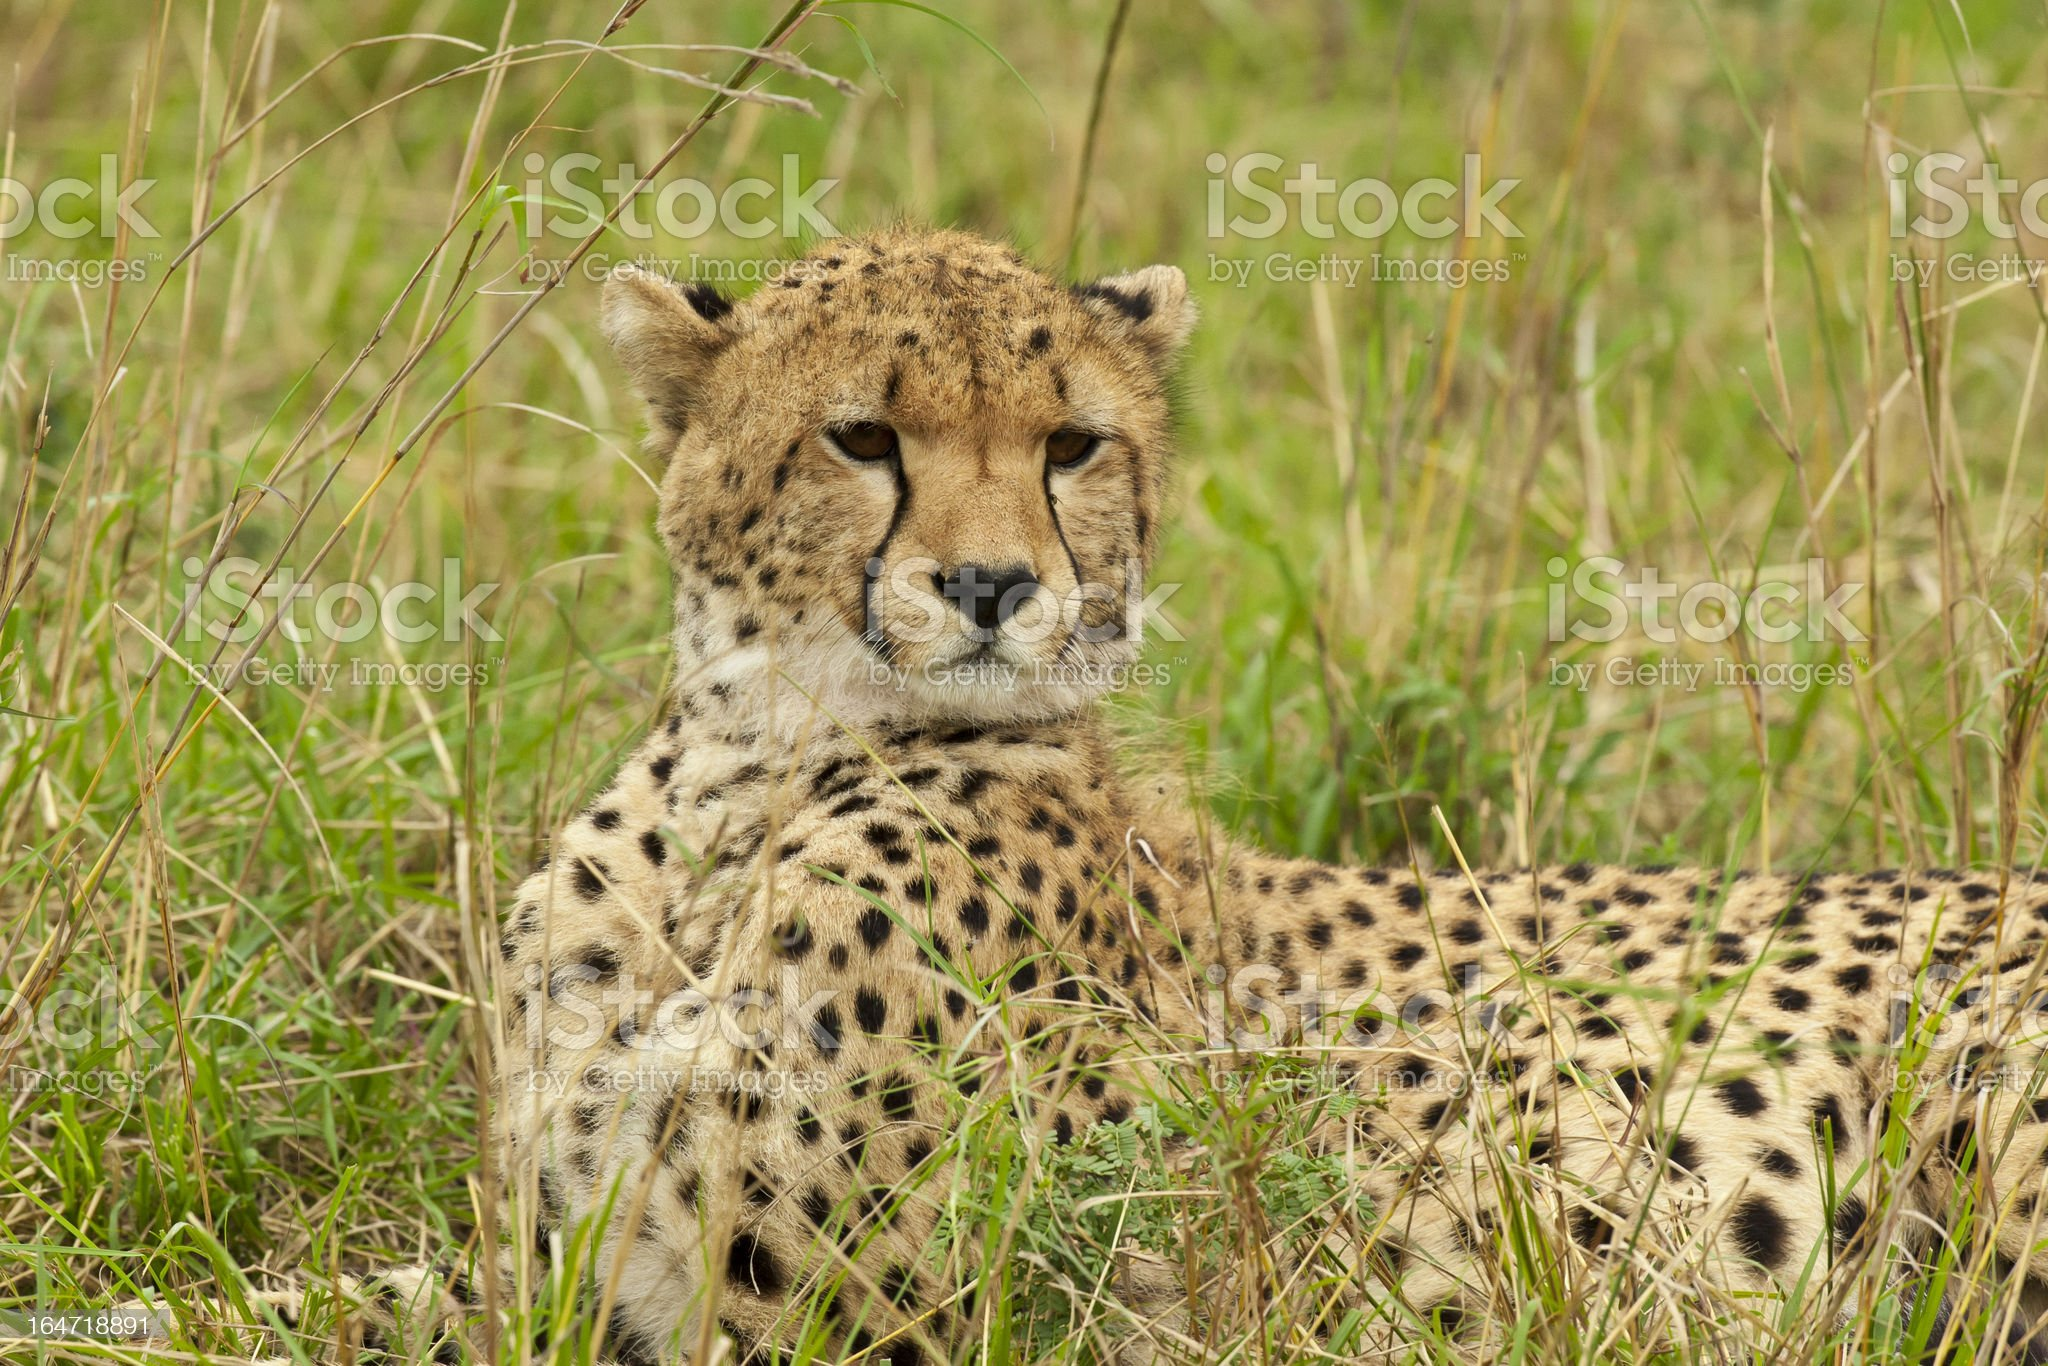 Cheetah in the Savannah royalty-free stock photo